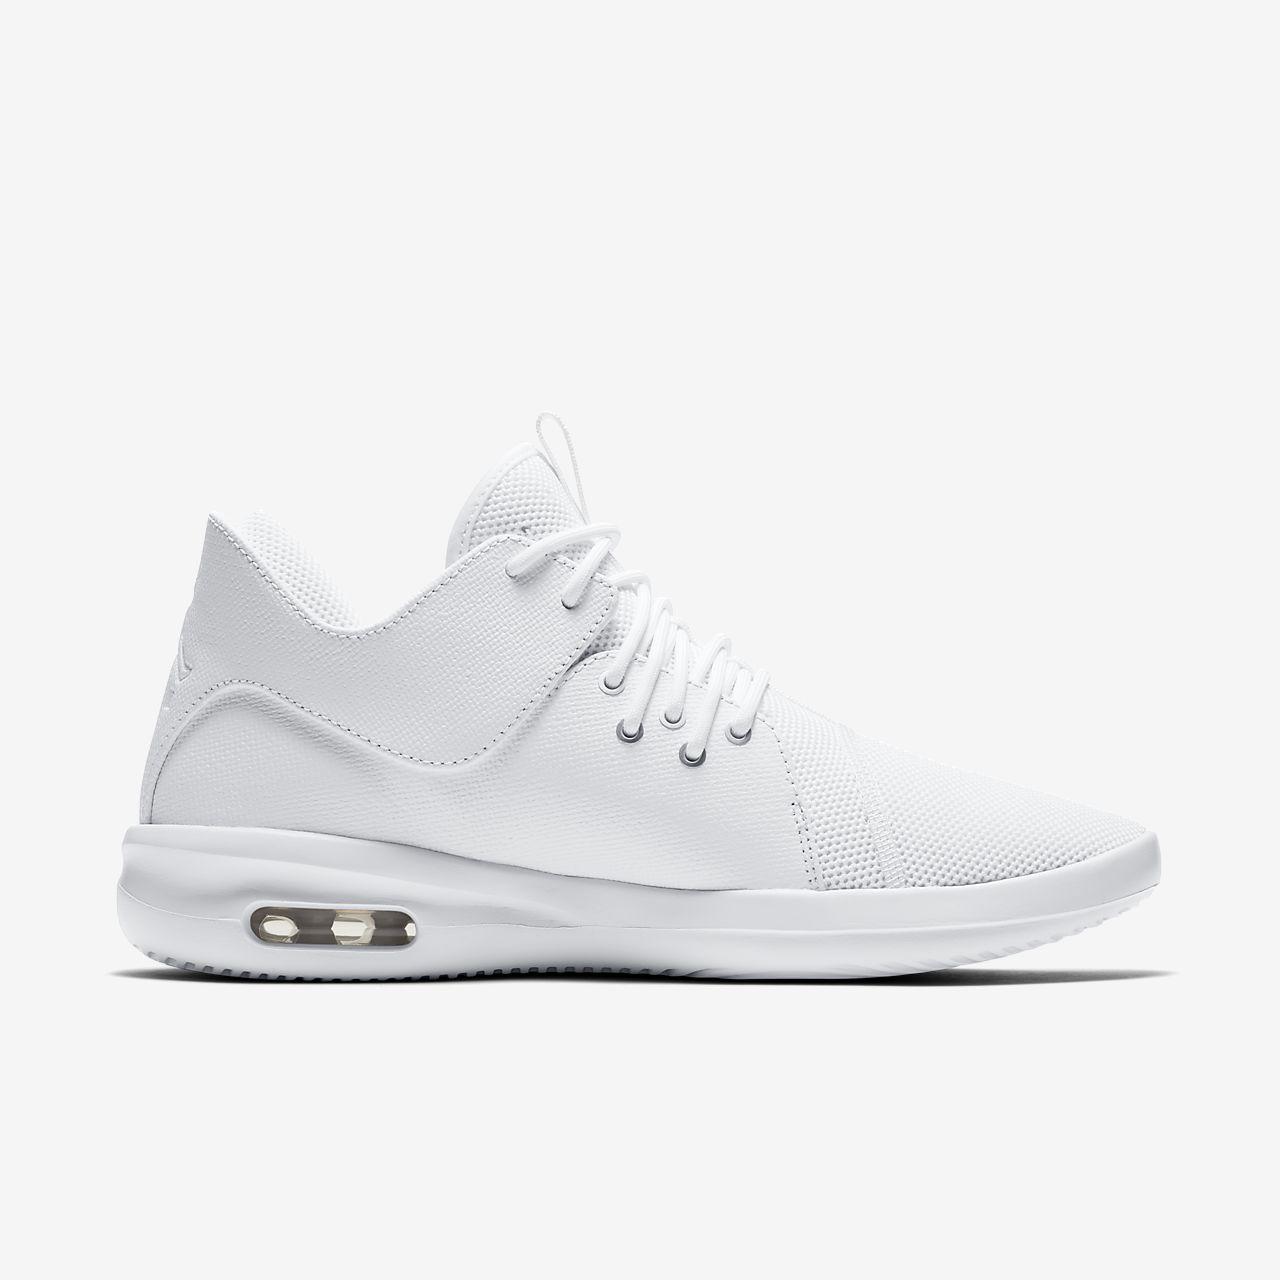 save off 3a373 d53dd Chaussure Air Jordan First Class pour Homme - Blanc